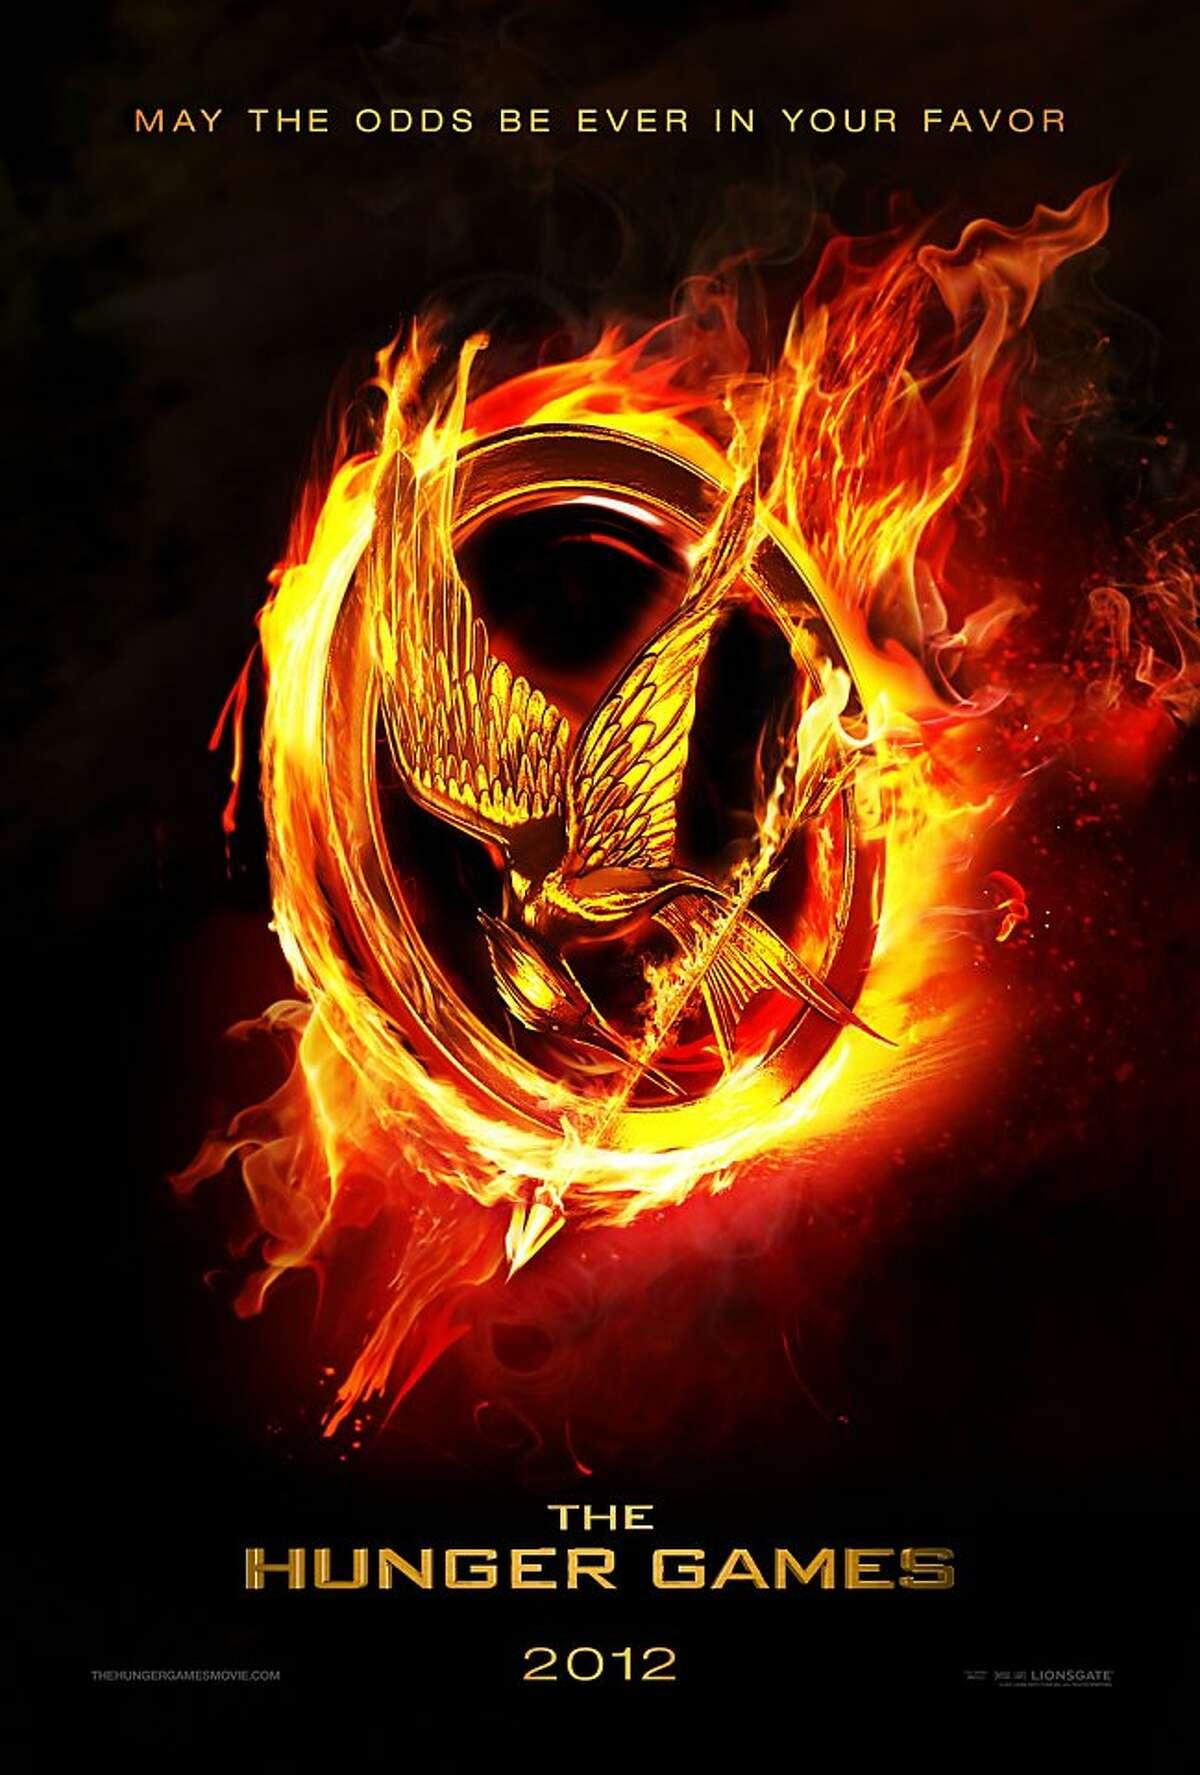 The Hunger Games teaser poster